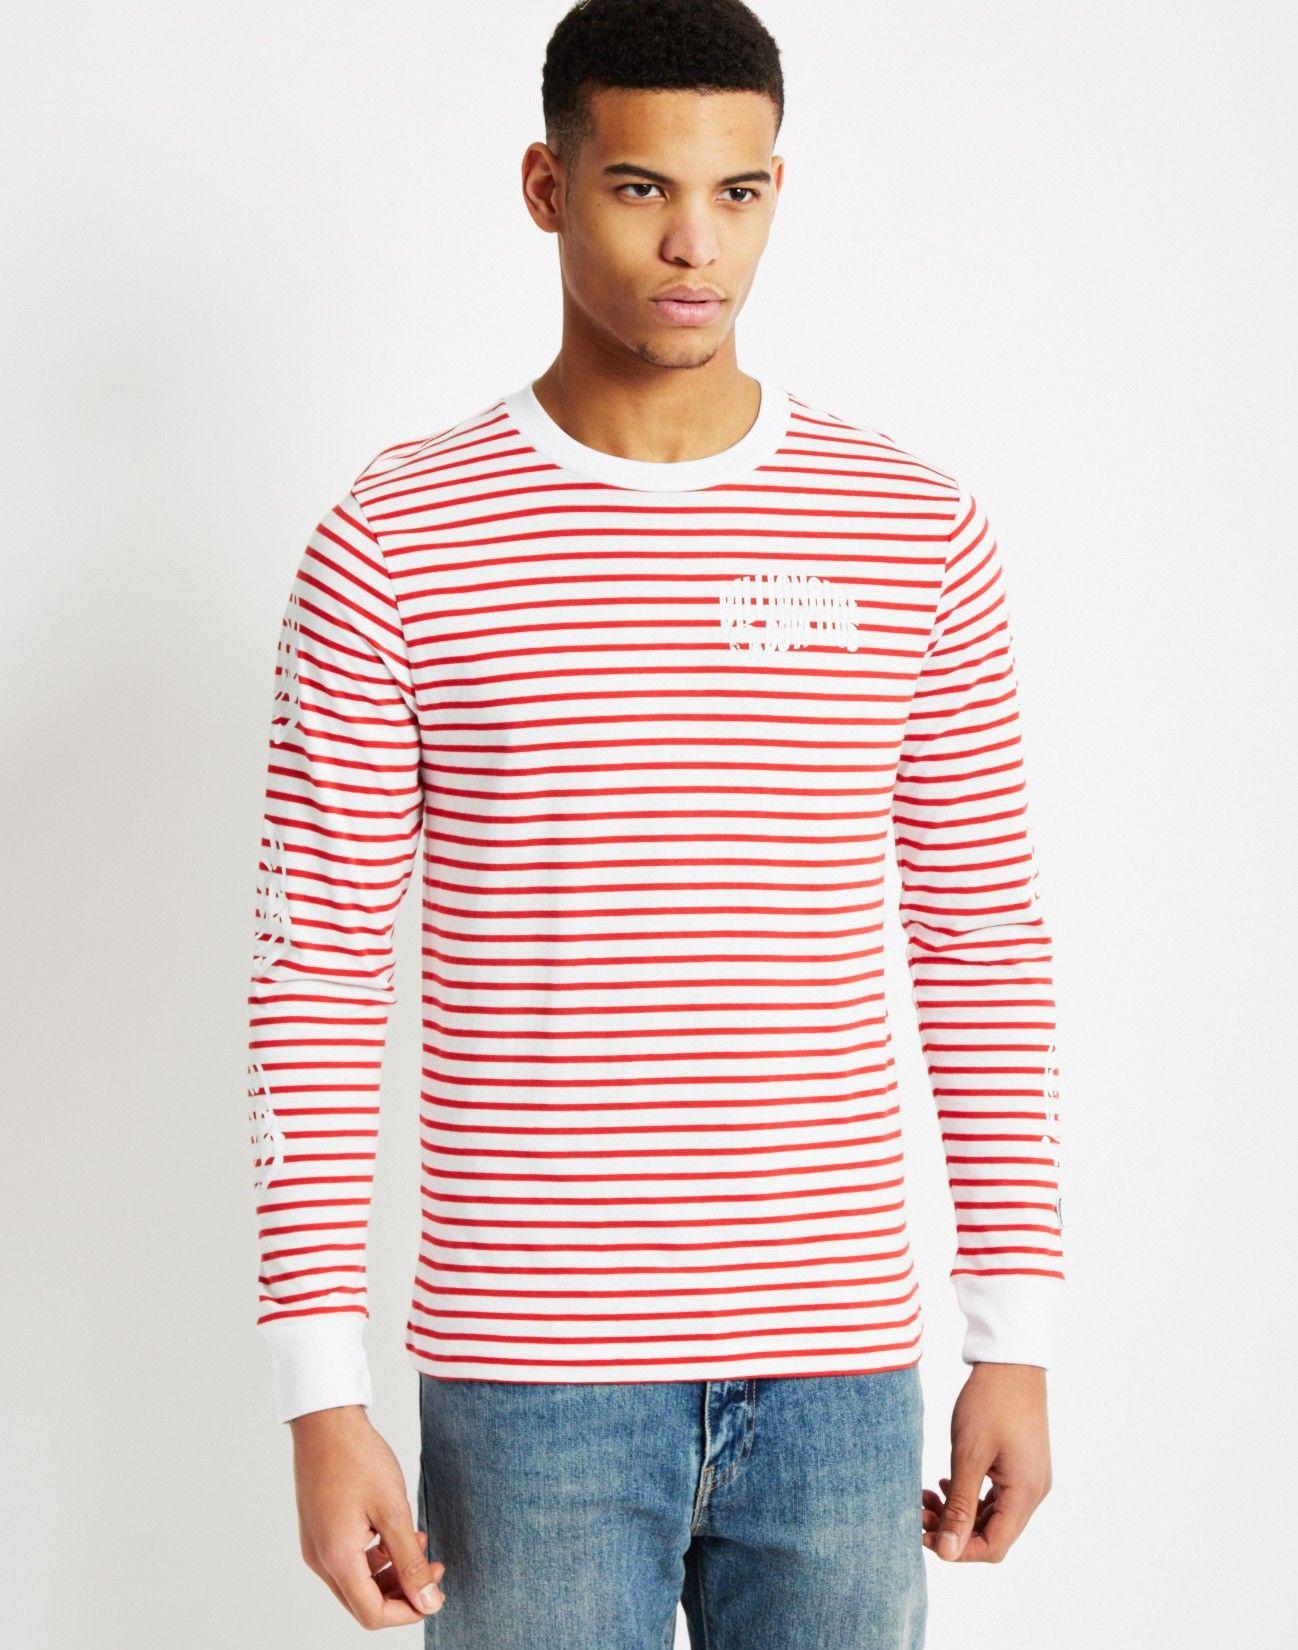 a457fe8081b Billionaire Boys Club Striped Long Sleeve T-Shirt Red   Shop men's street  wear clothing